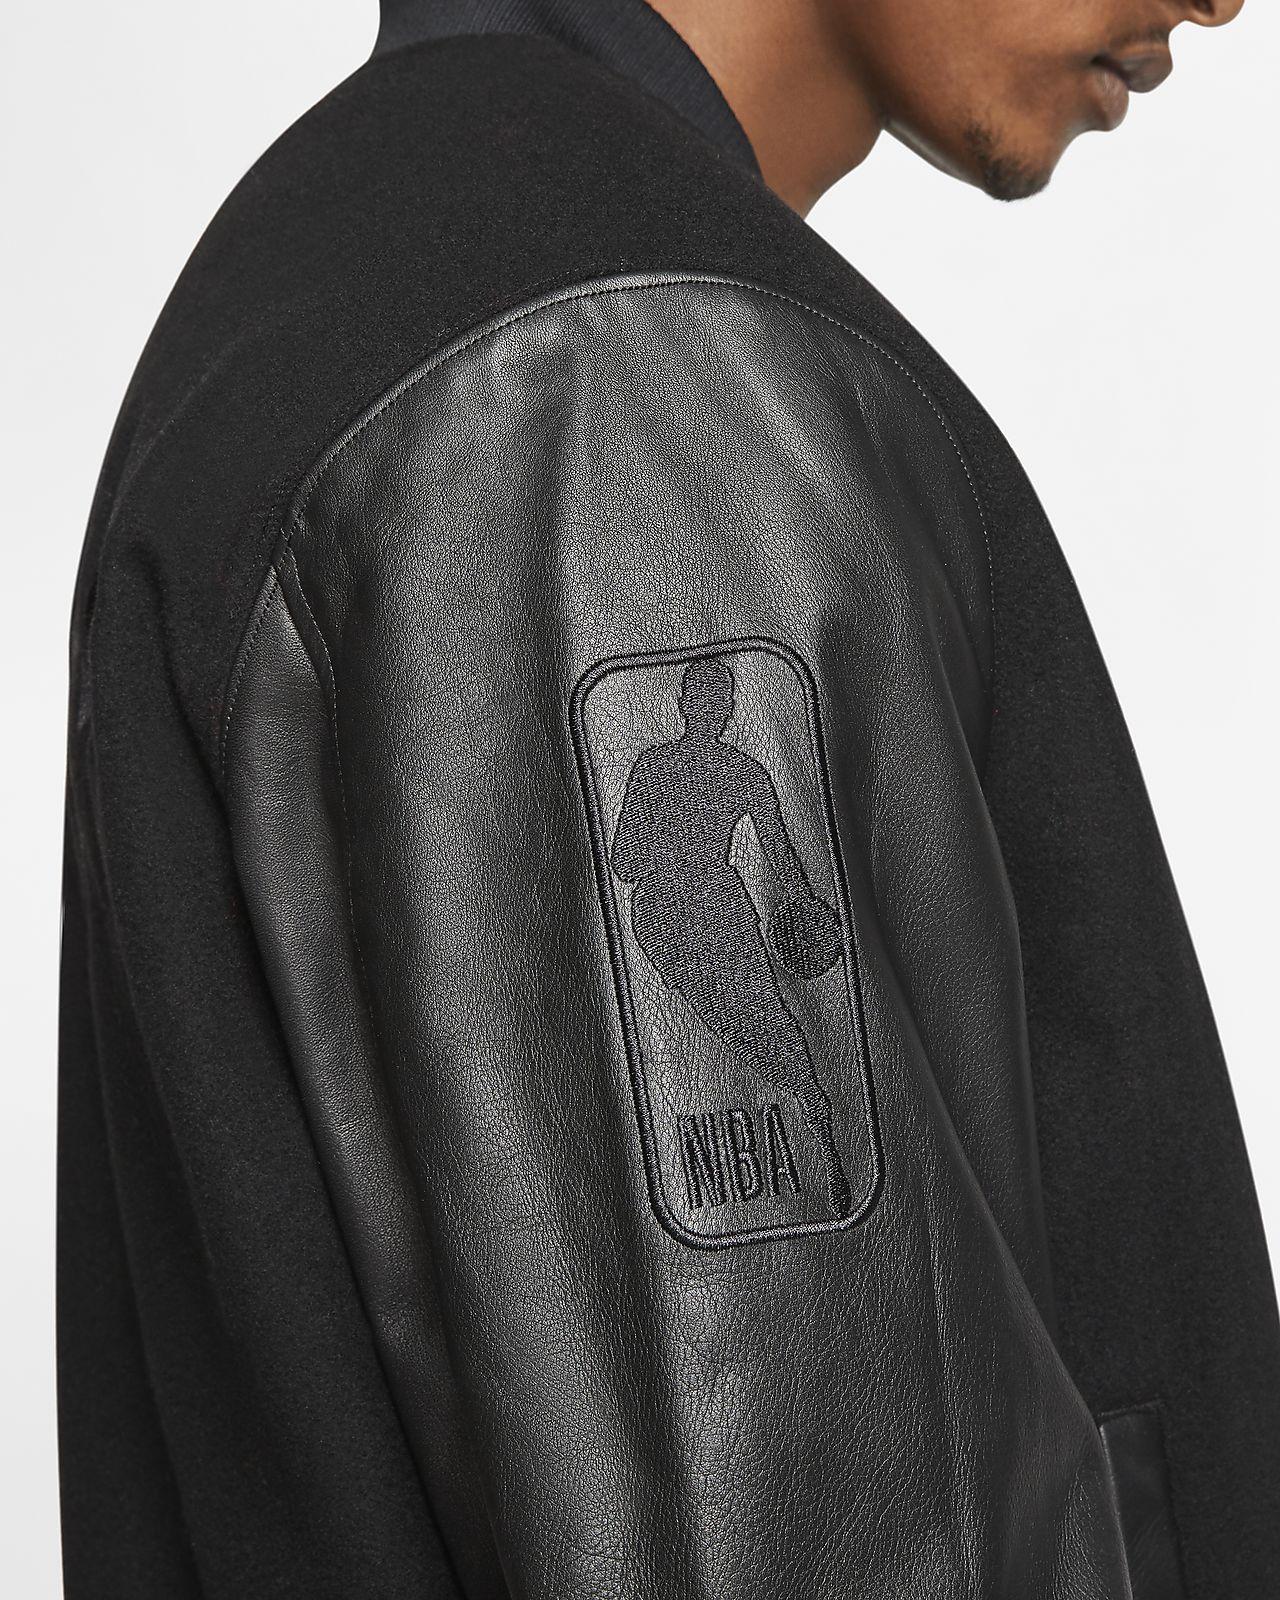 Men's Destroyer Jacket 'Paris' Nike Courtside NBA LqpMVGSUz